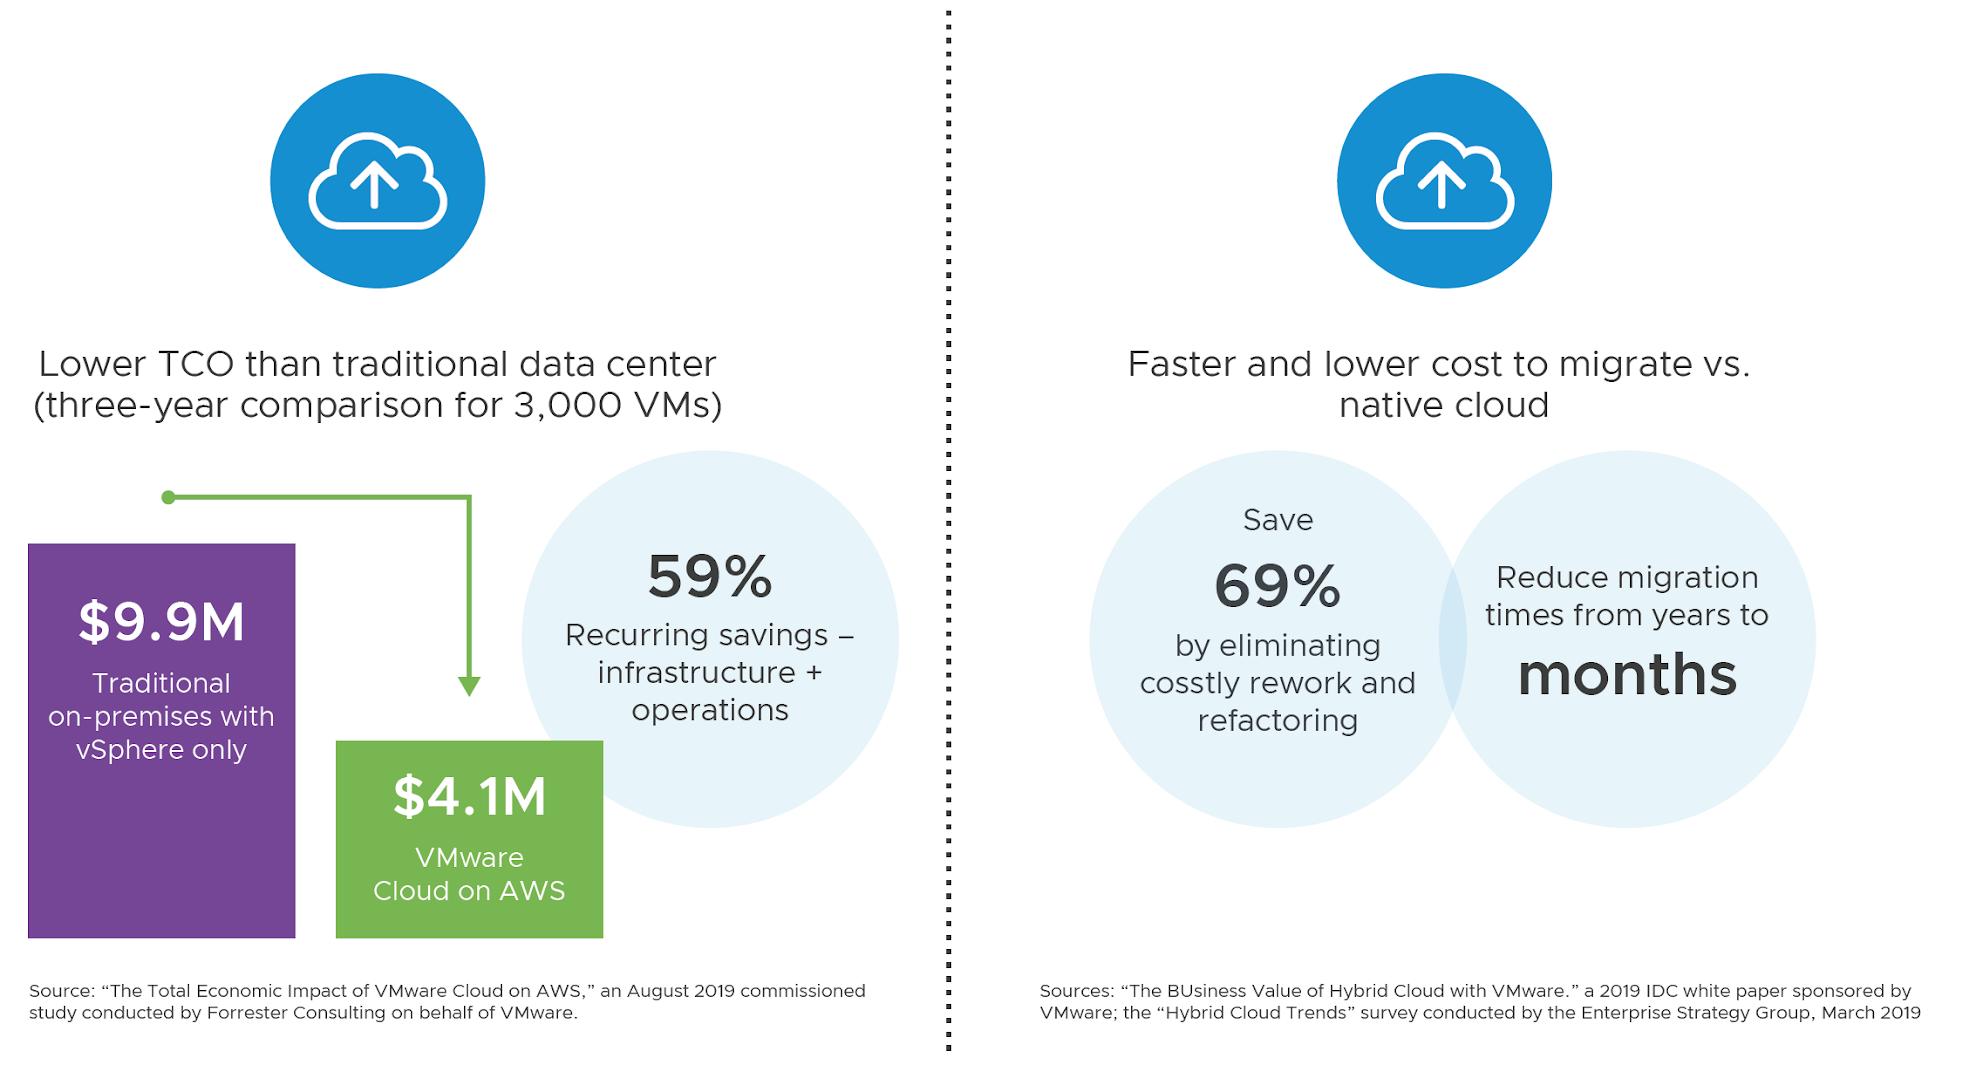 Cloud Foundation customer benefits